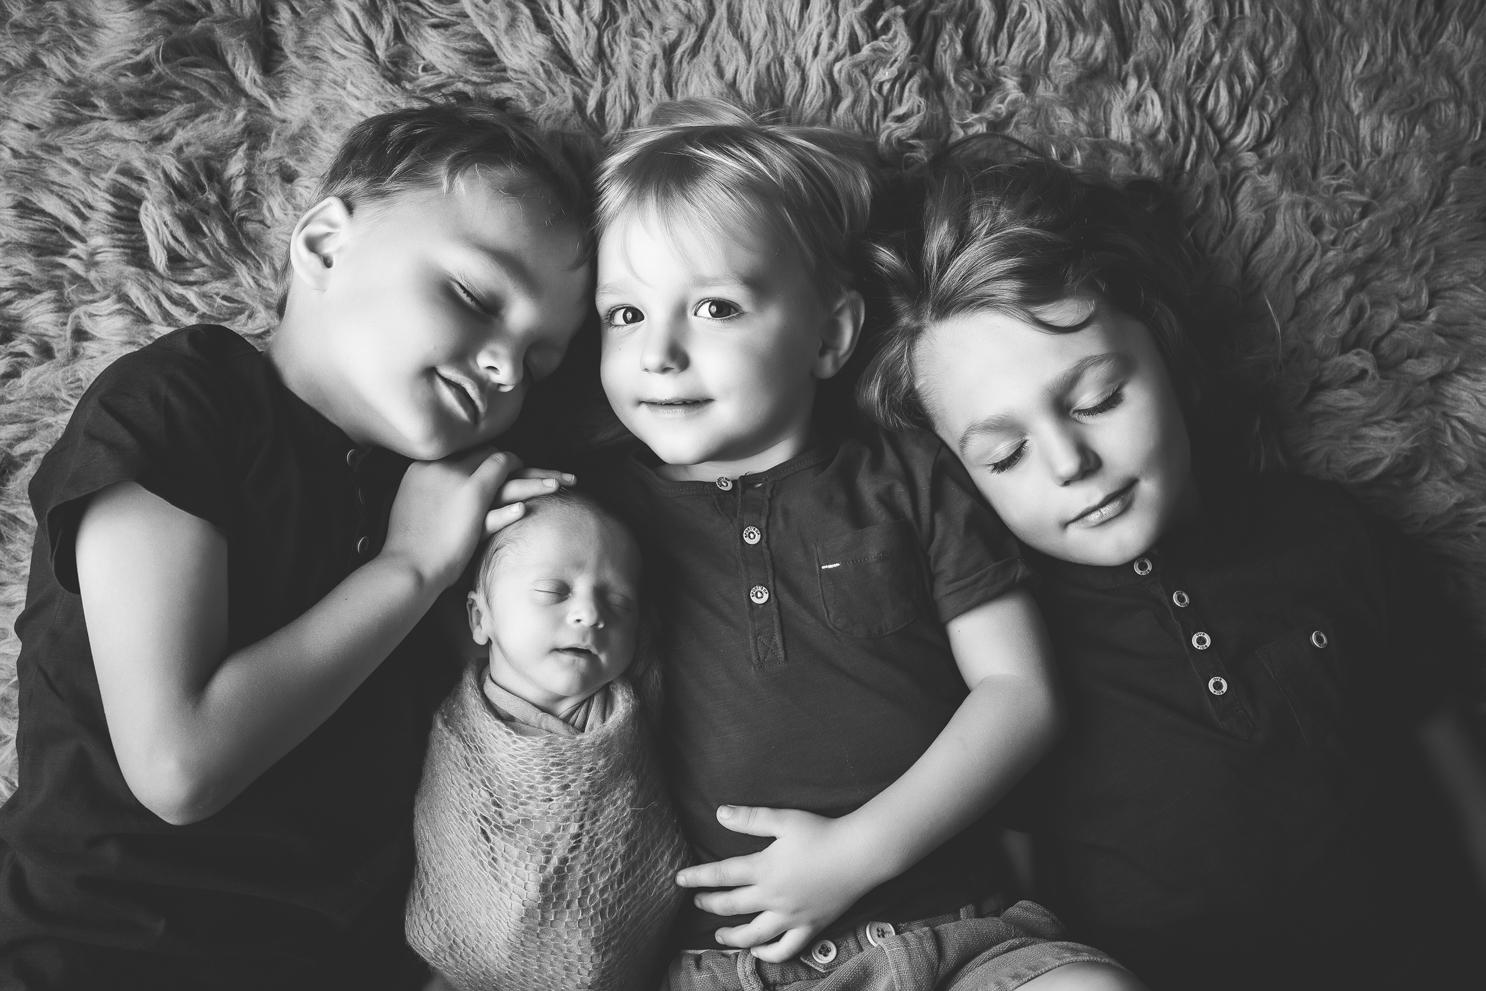 Neugeborenenshooting, Babyfotografie, Baby, Newborn, Zentralschweiz